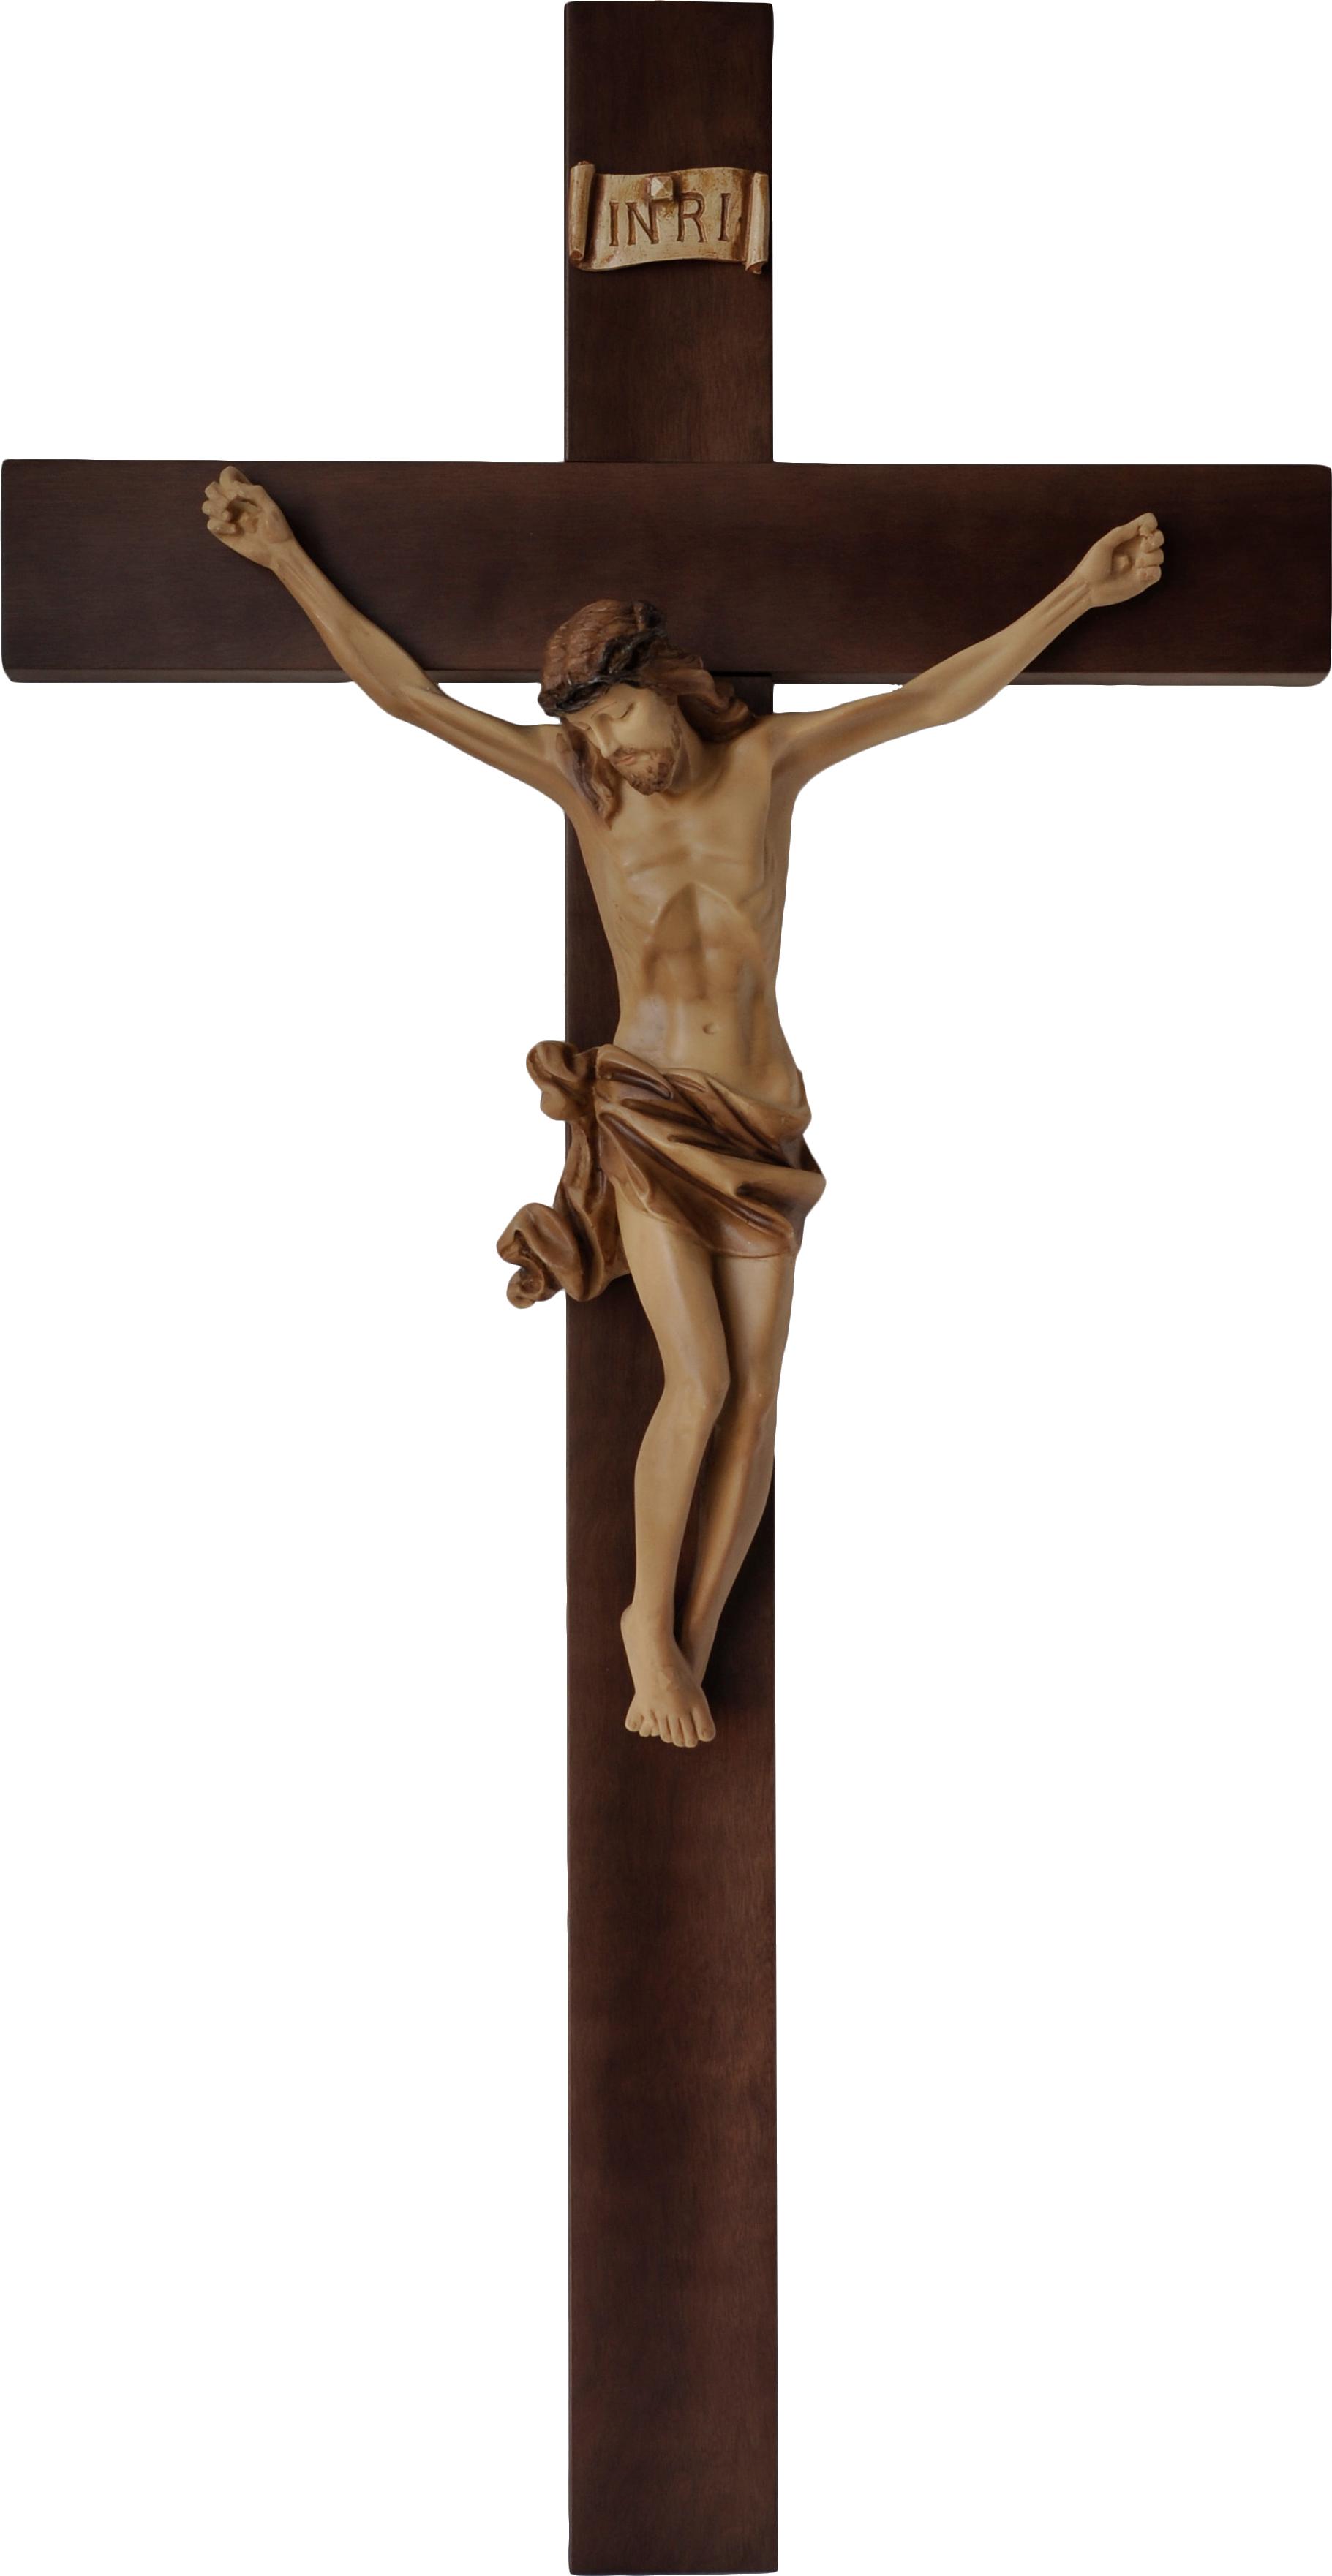 Crucifix clipart transparent background. Christian cross png images